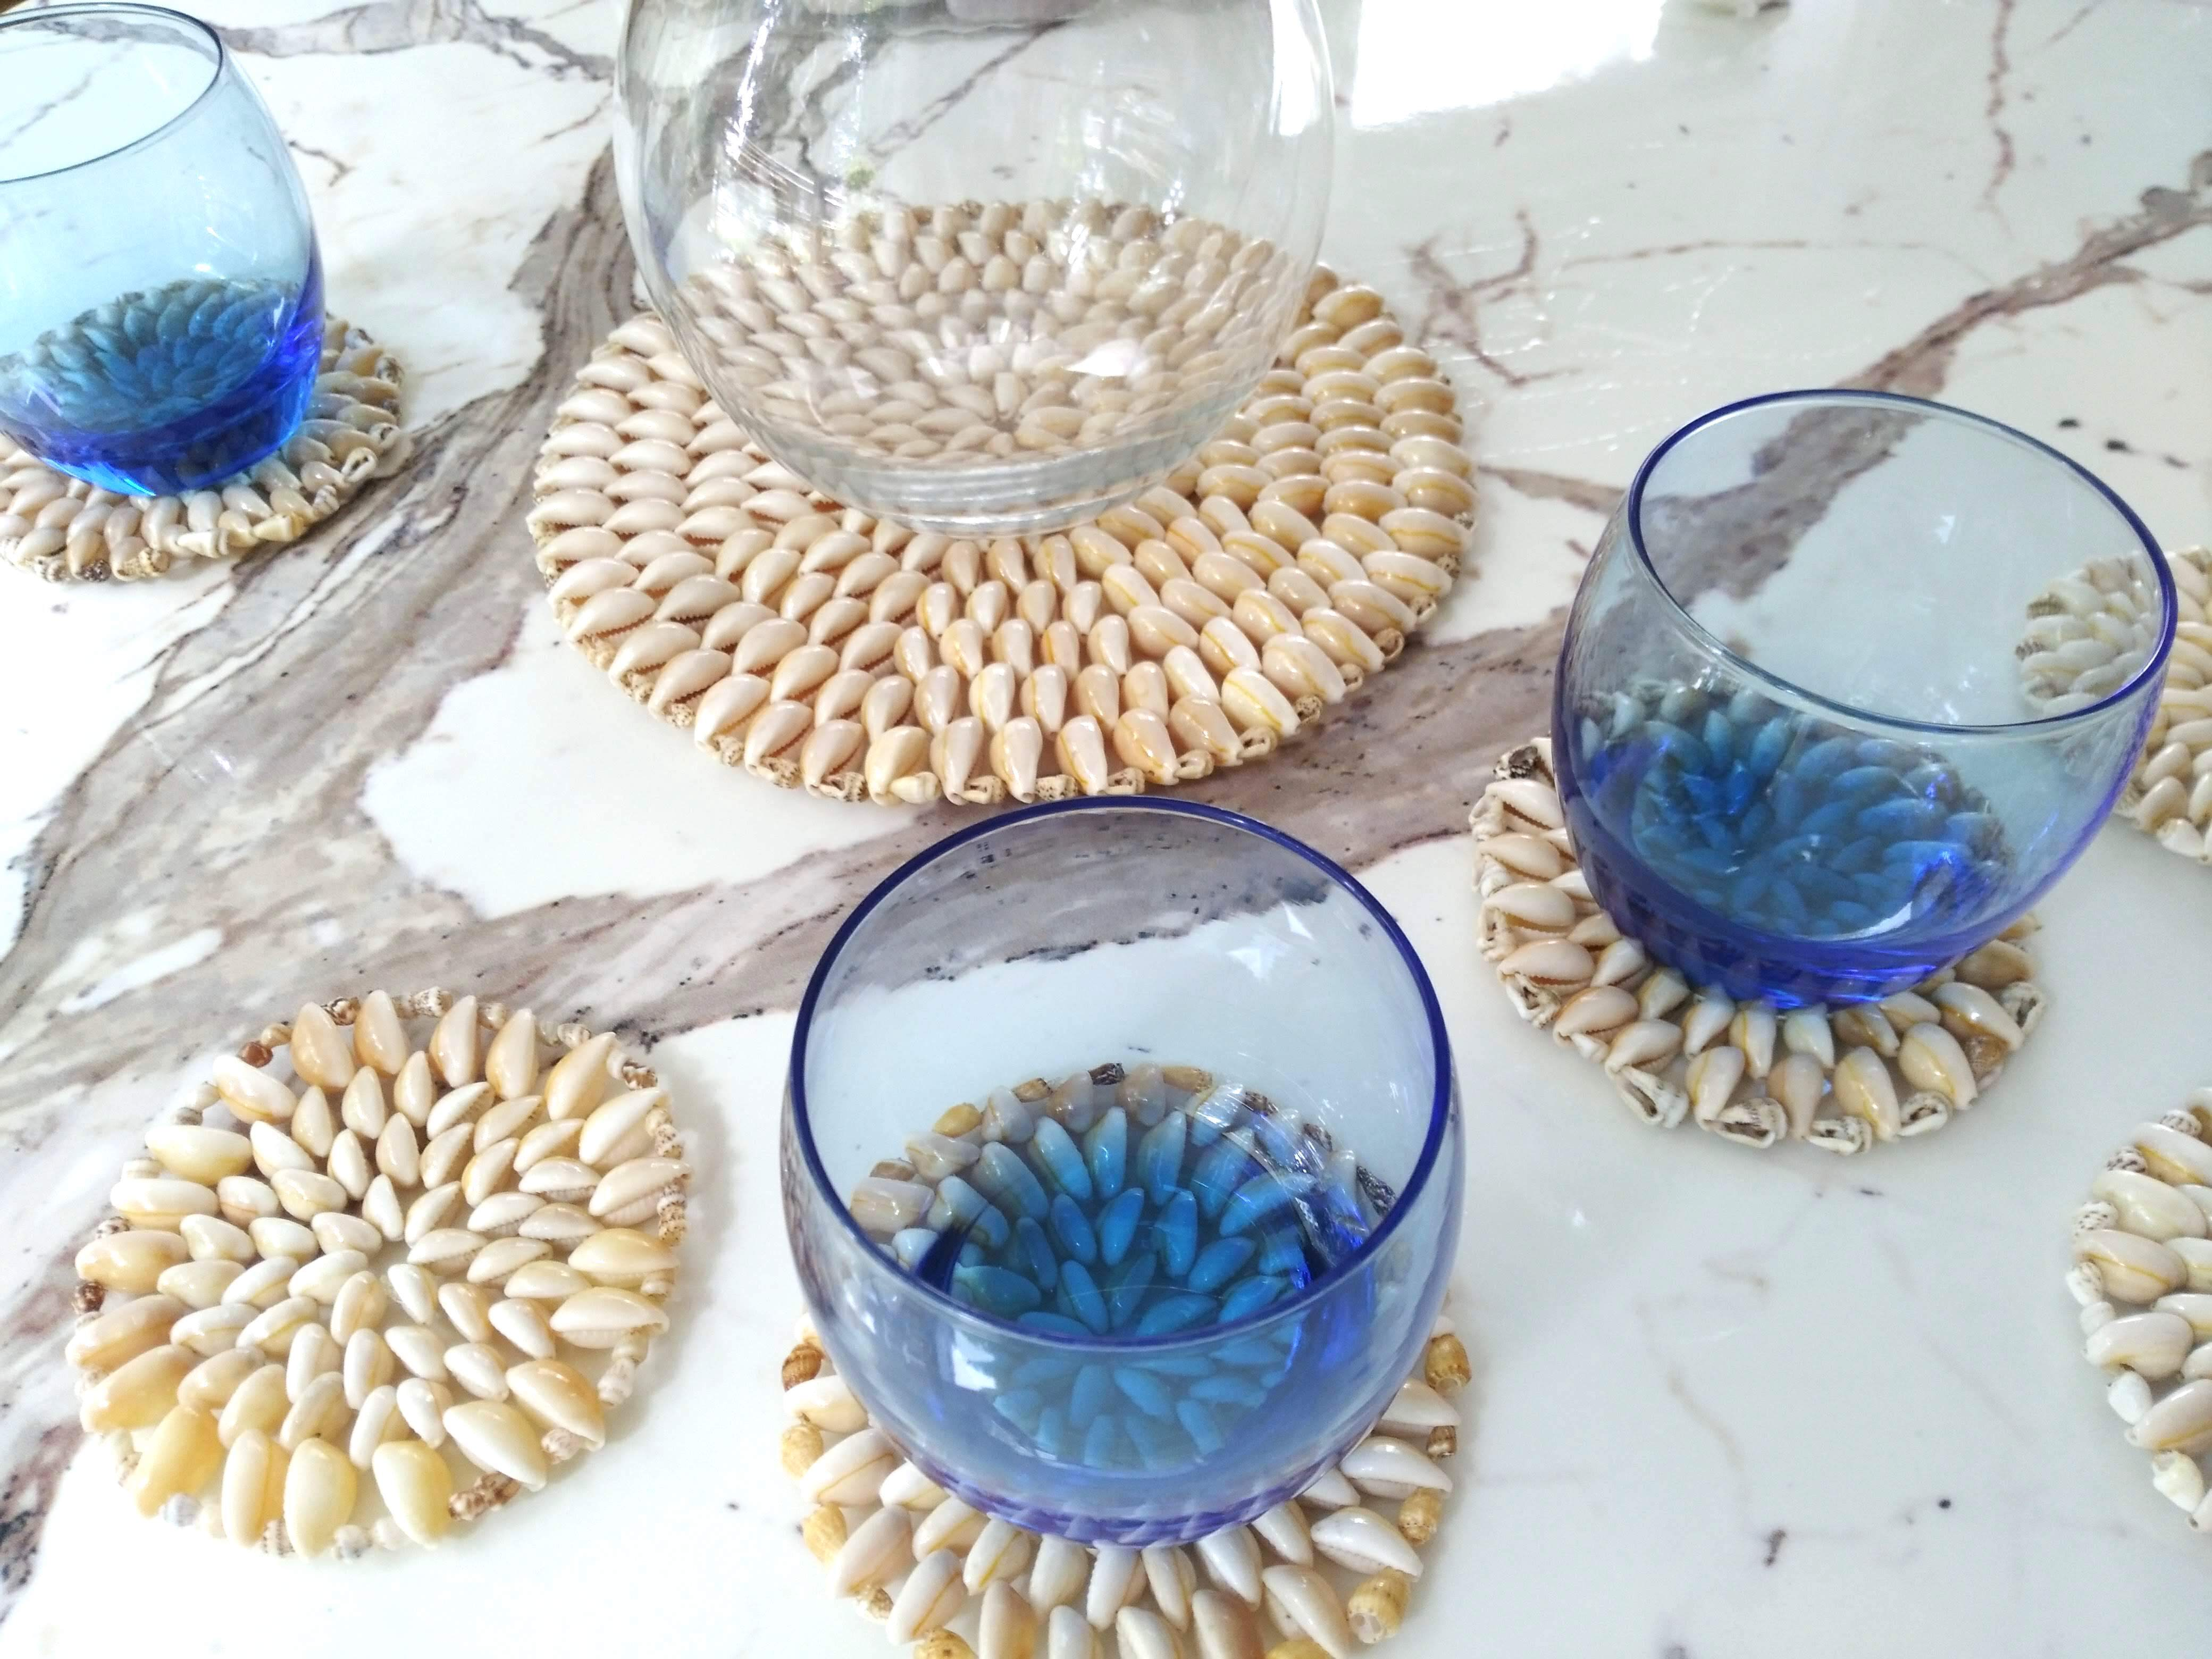 Aegeansea style Cowrie Shell Coaster6p & Potmat1p エーゲ海スタイル宝貝のテーブルセット7点セット